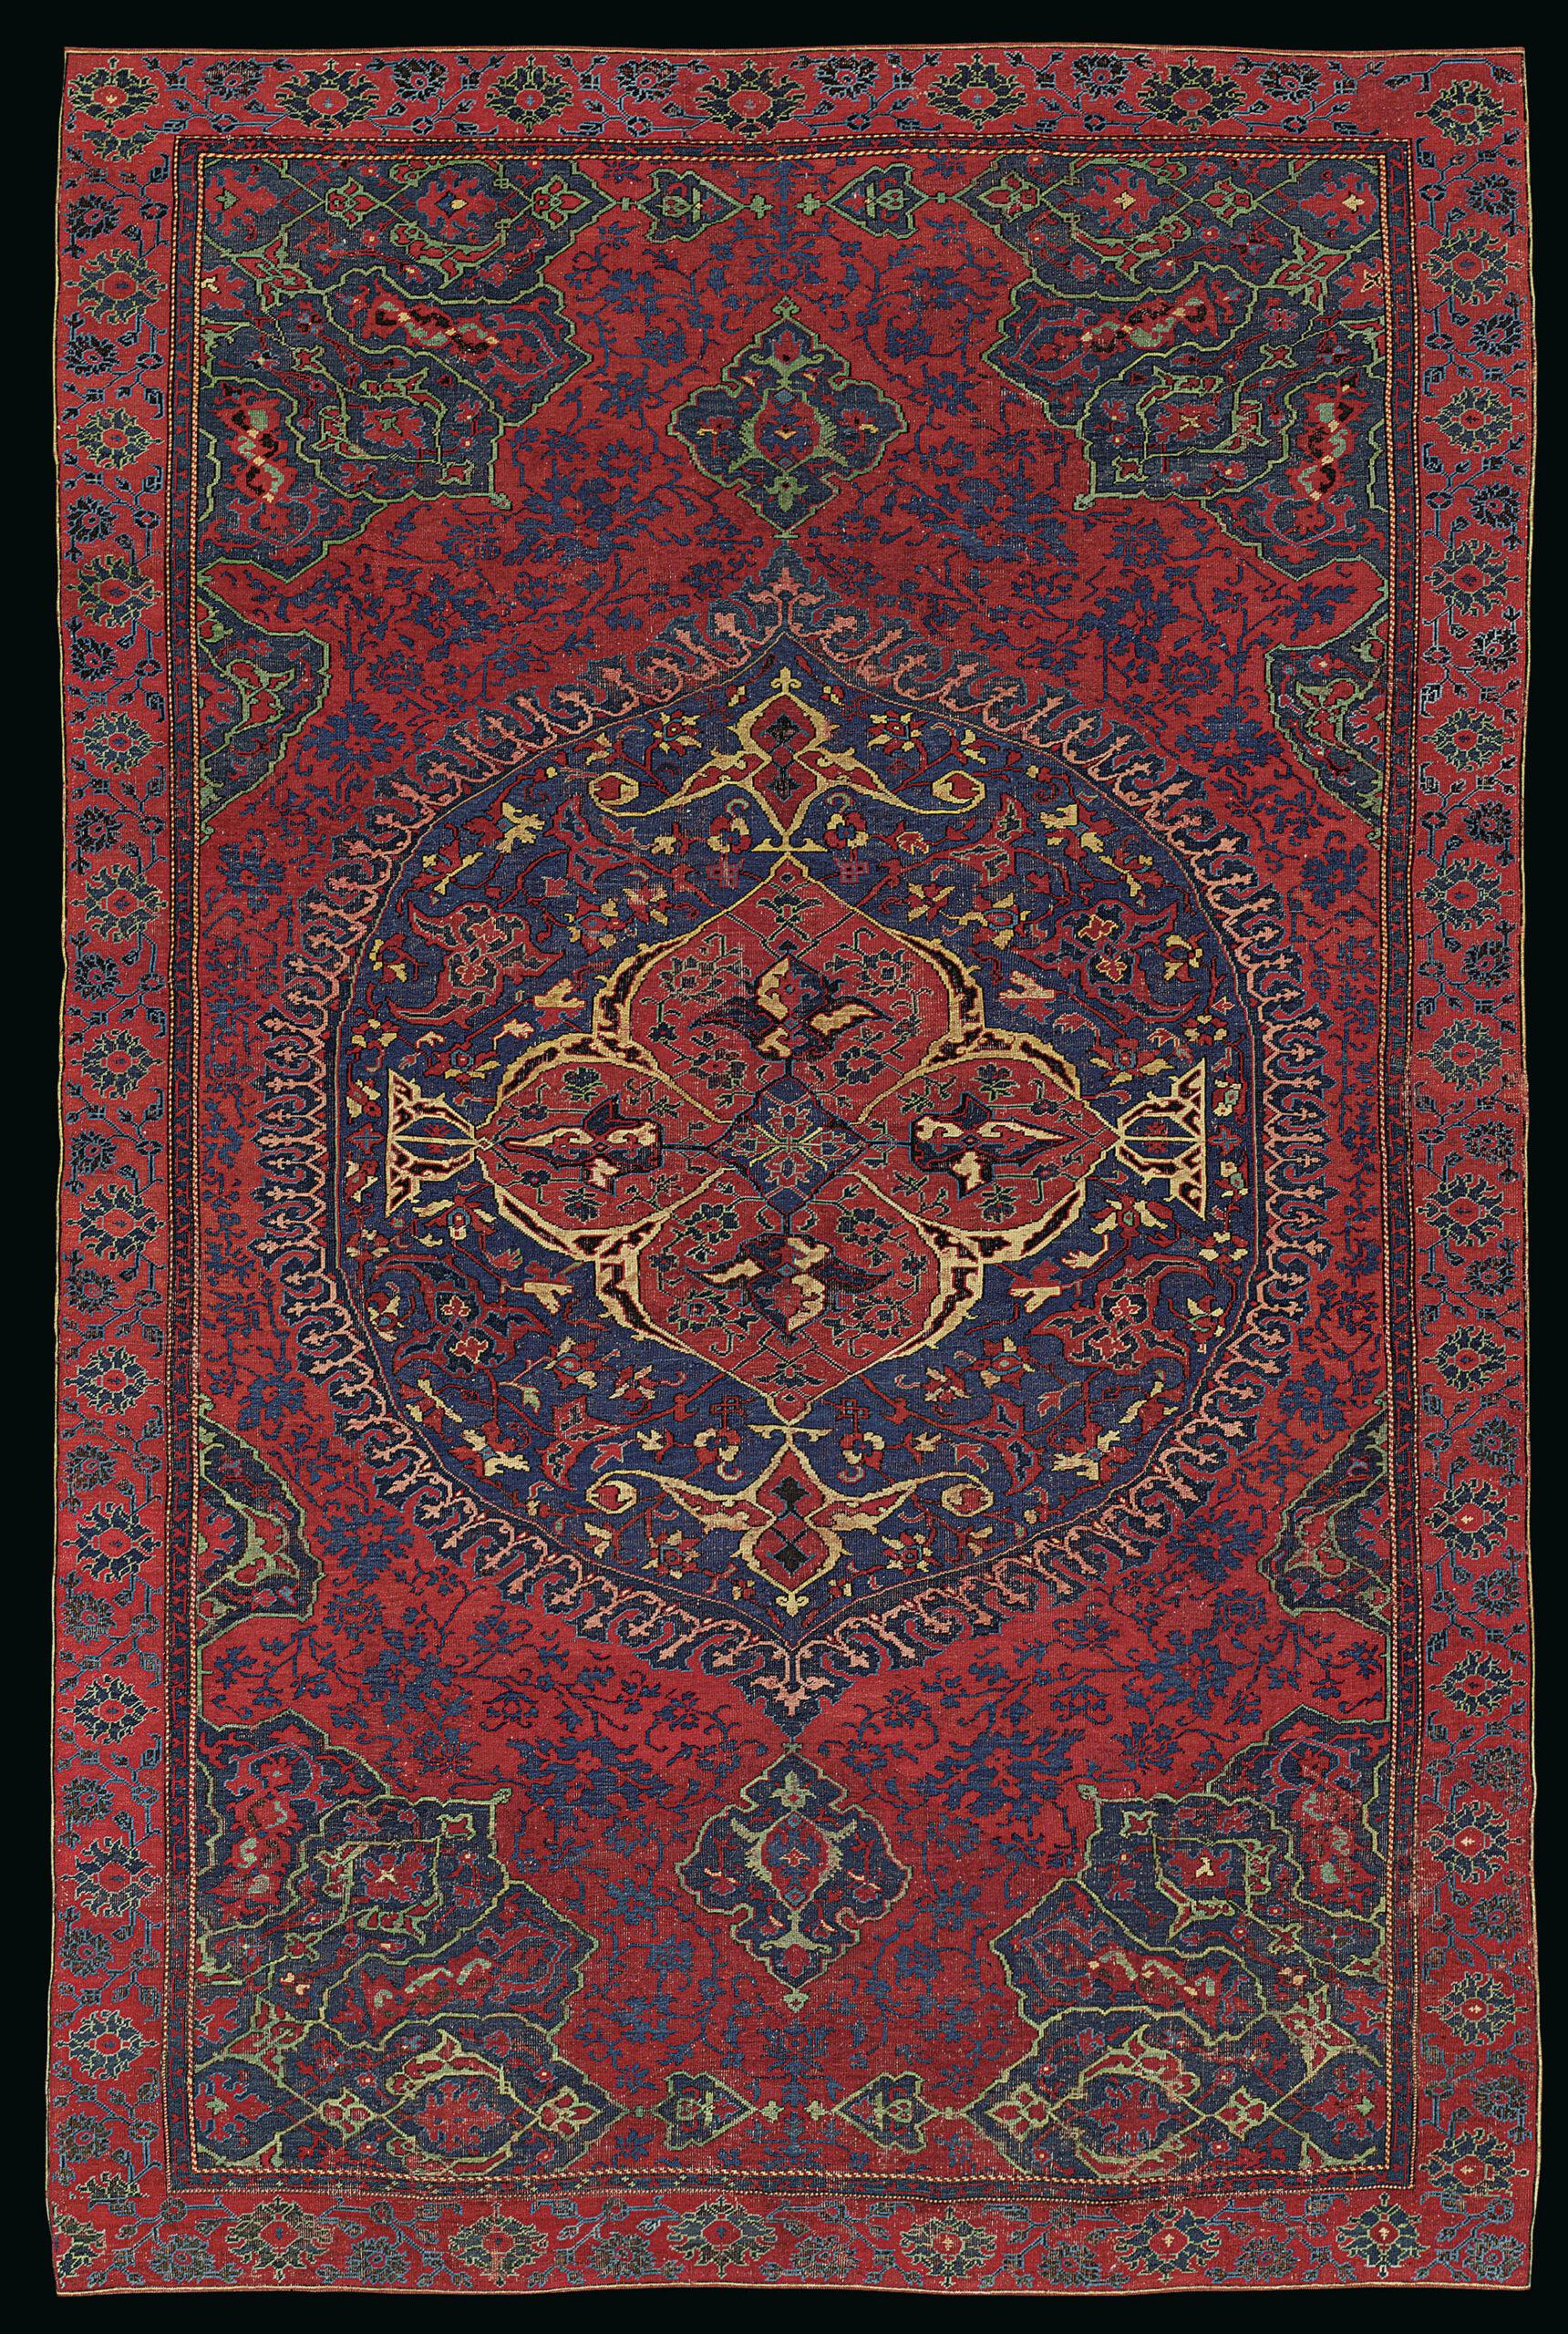 Ushak classical medellion carpet,  16th century